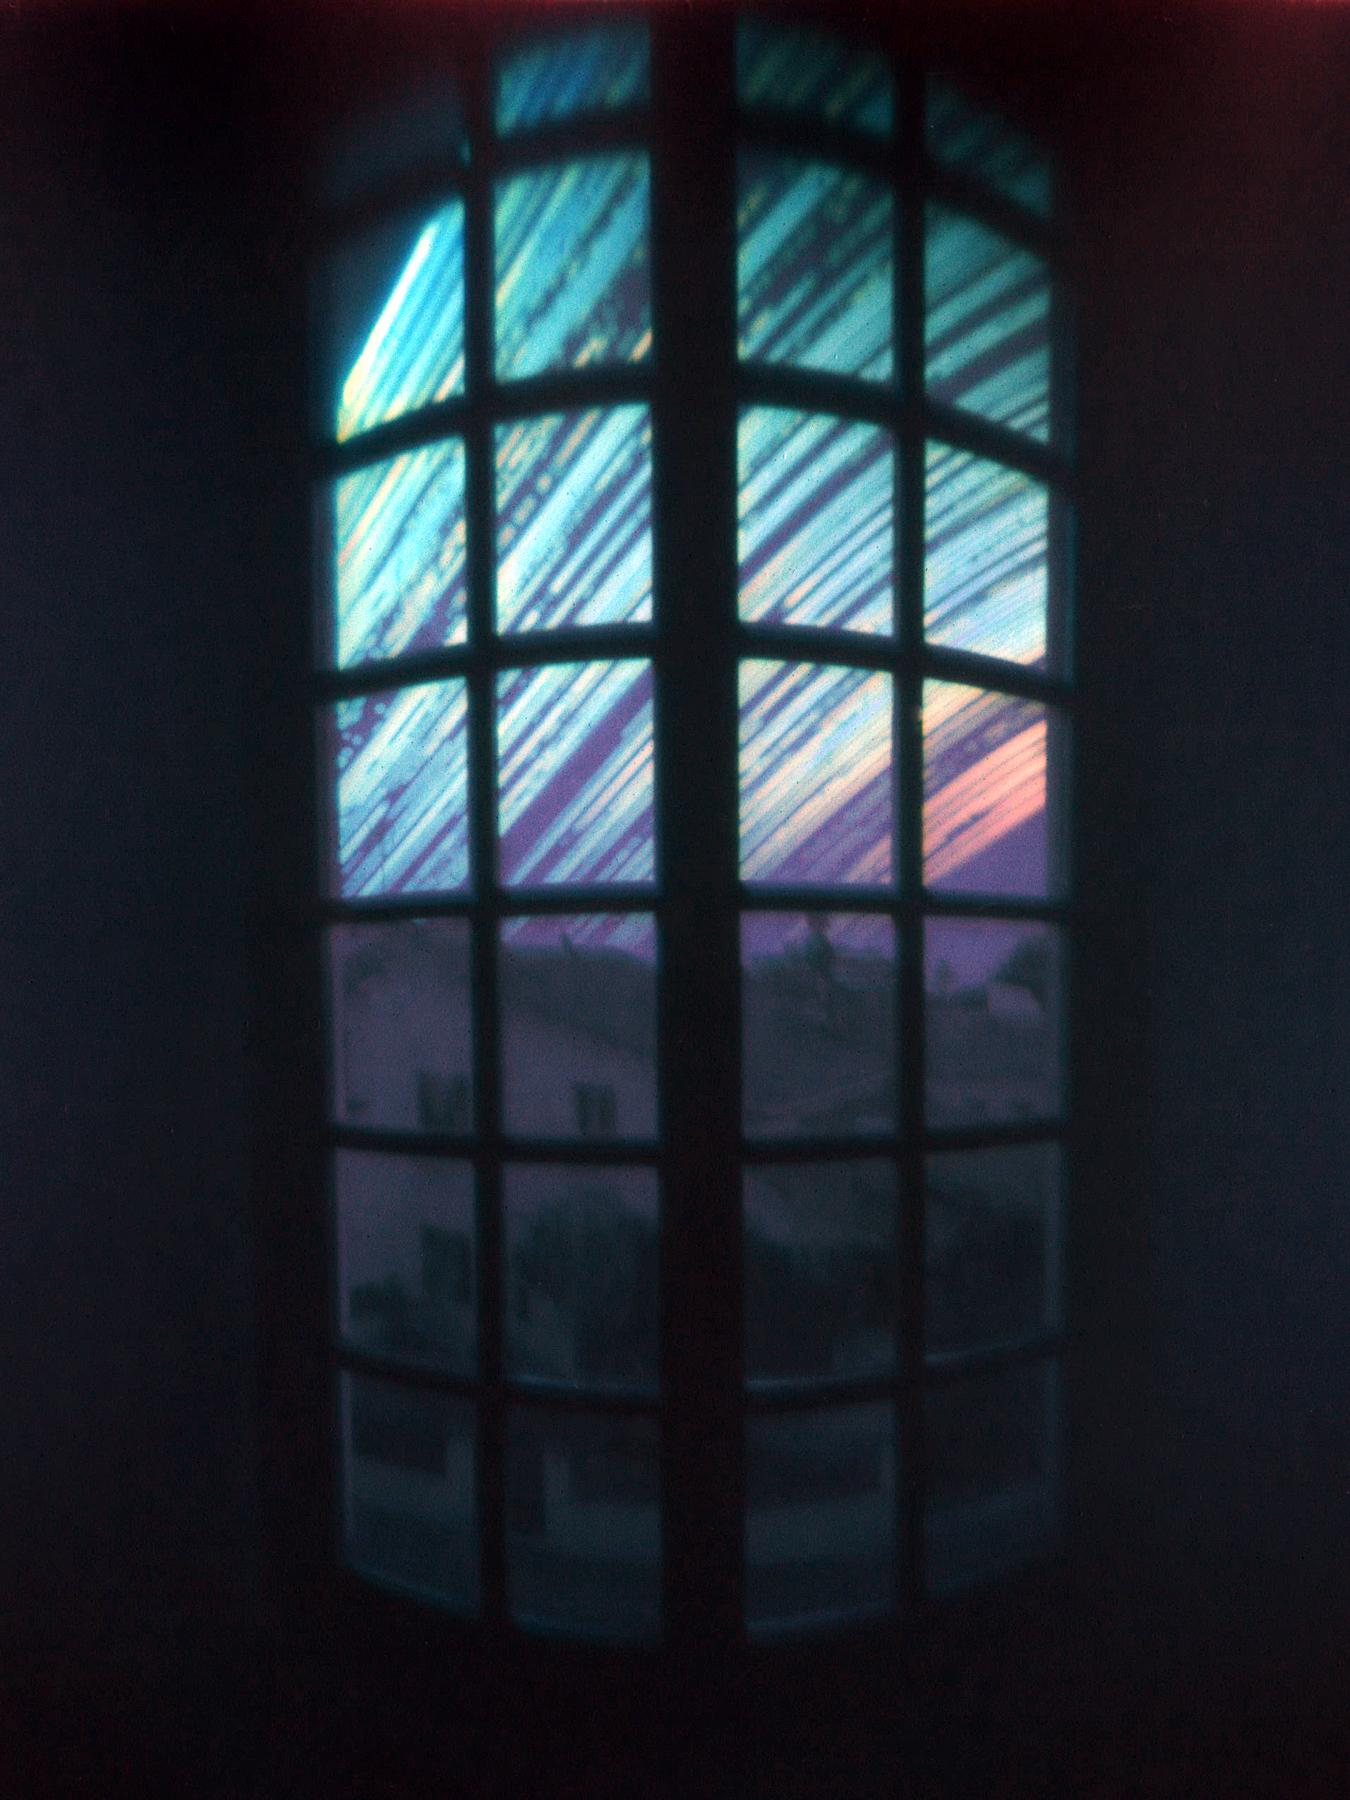 window of enlightment | solargraphy drinkcan camera pinhole | Jesús Joglar